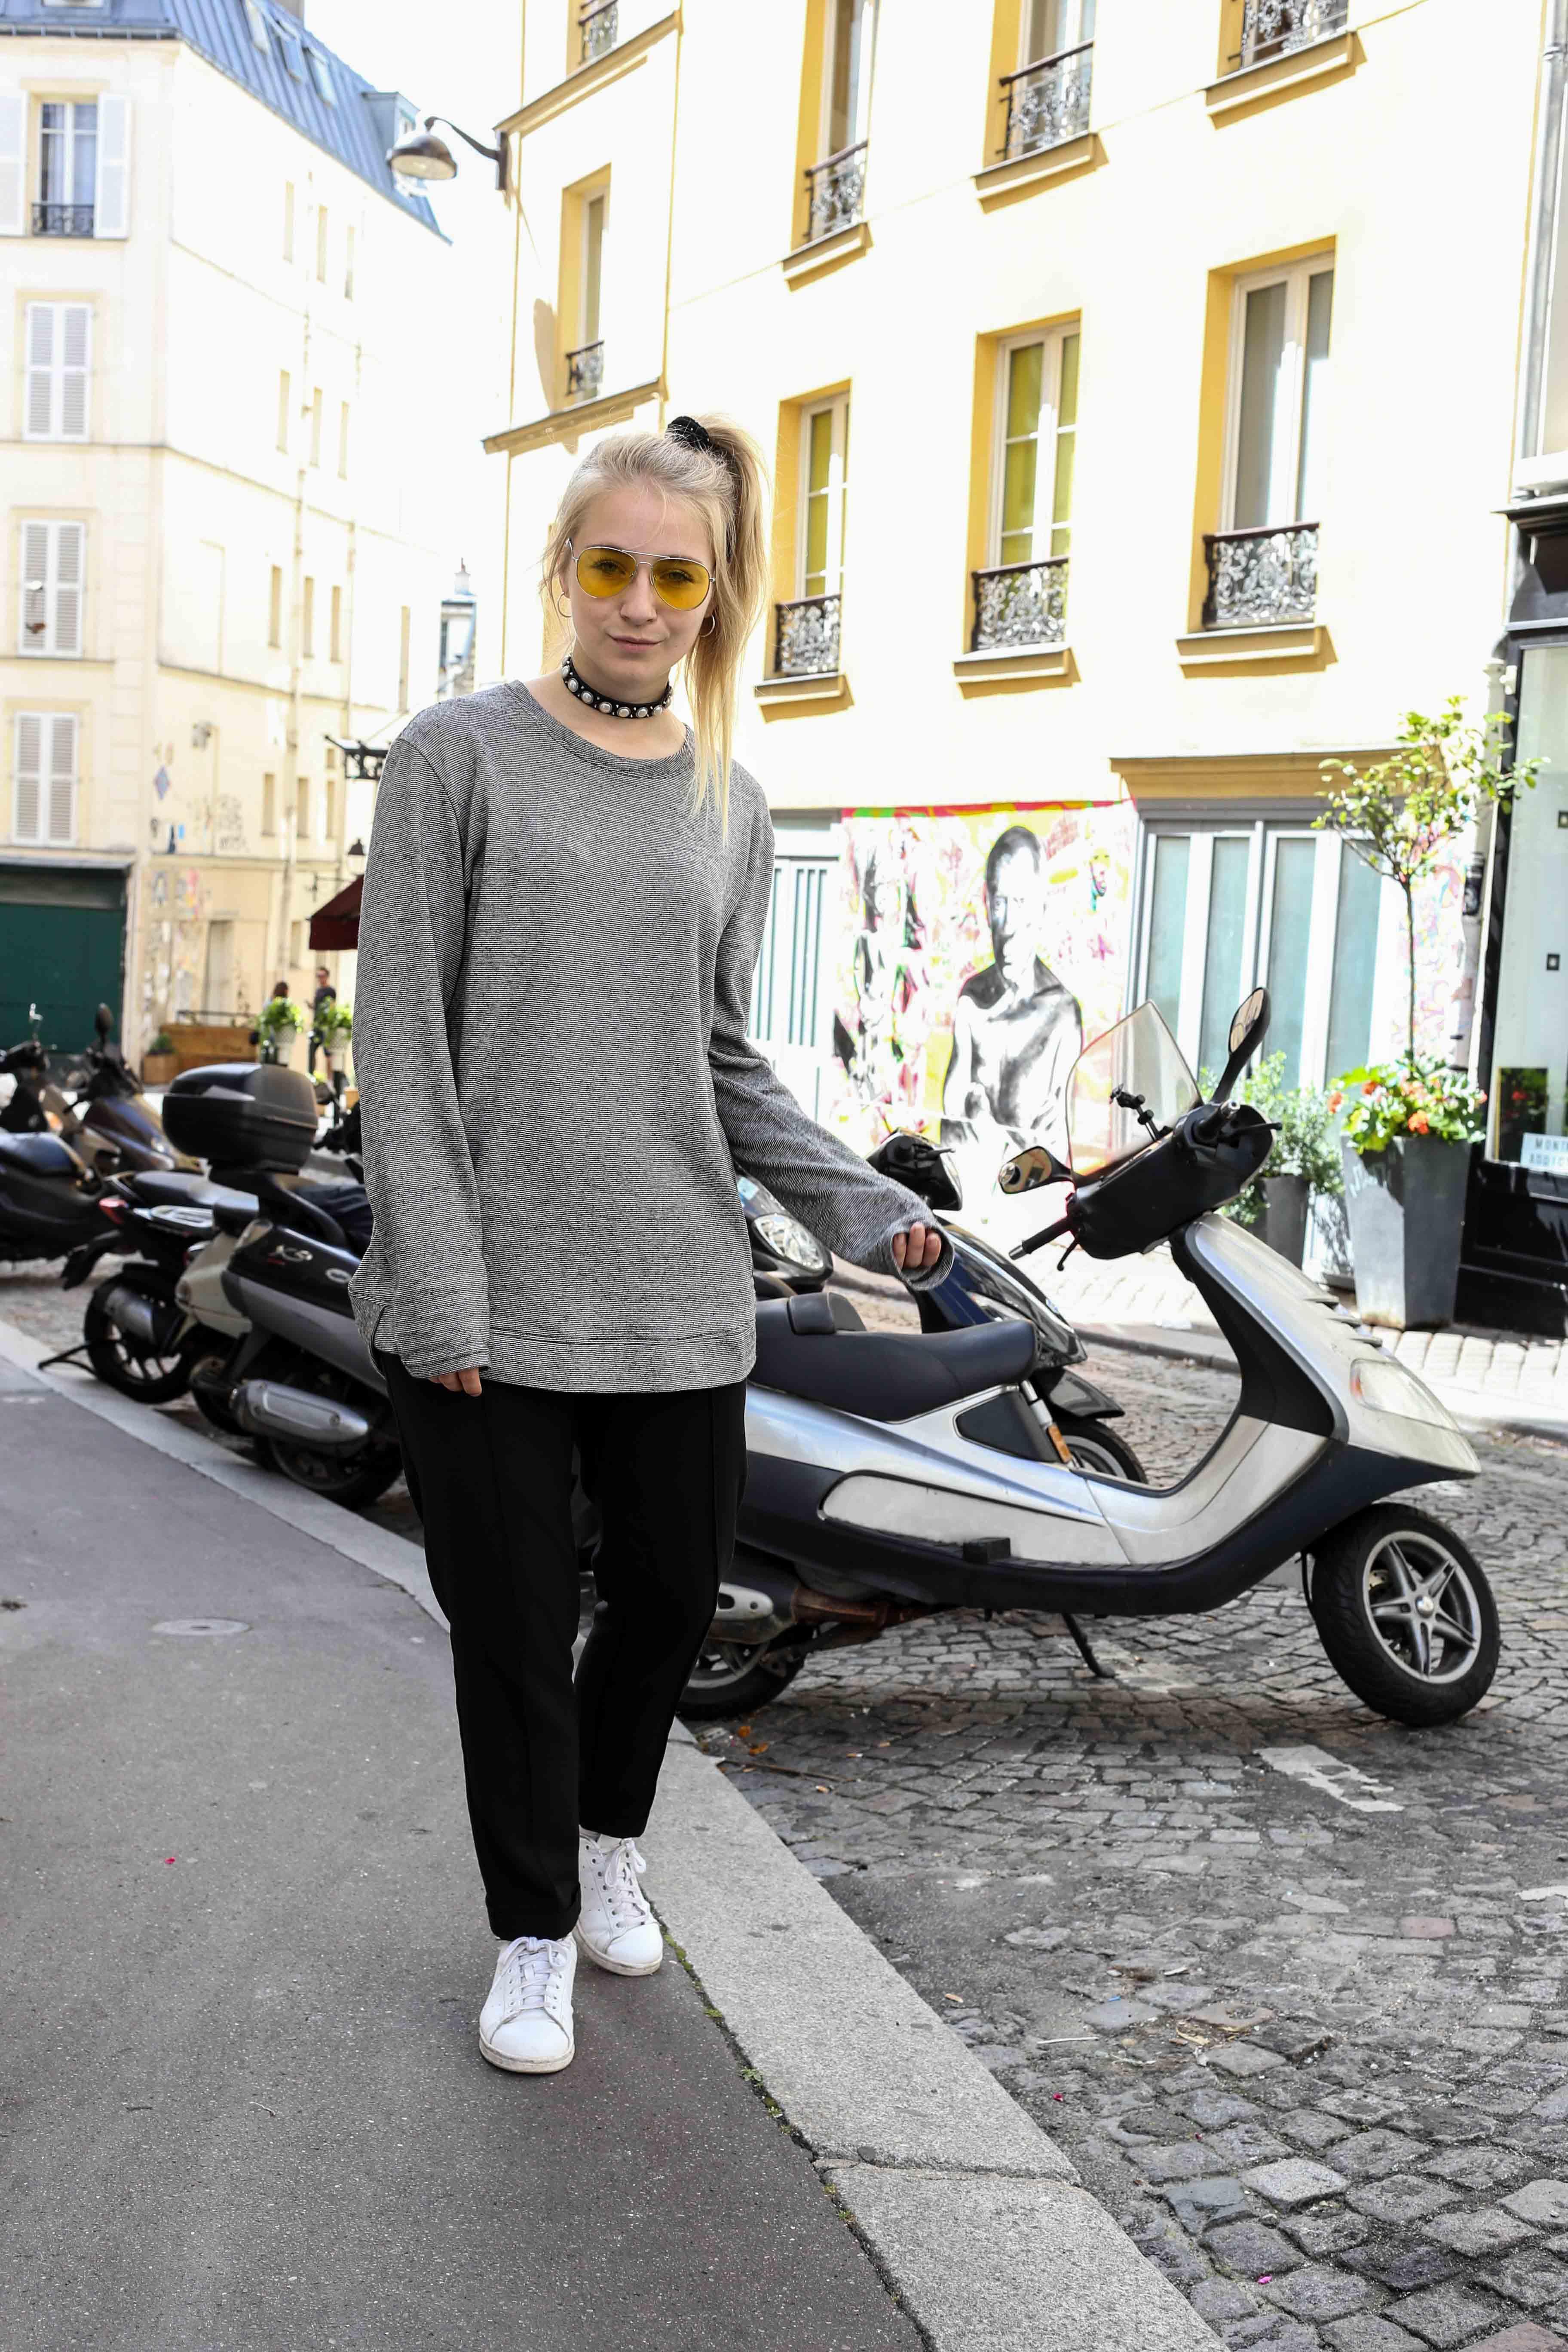 streetstyle-look-paris-loose-fit-hose-boyfriend-sweater-modeblog-fashionblog_2392